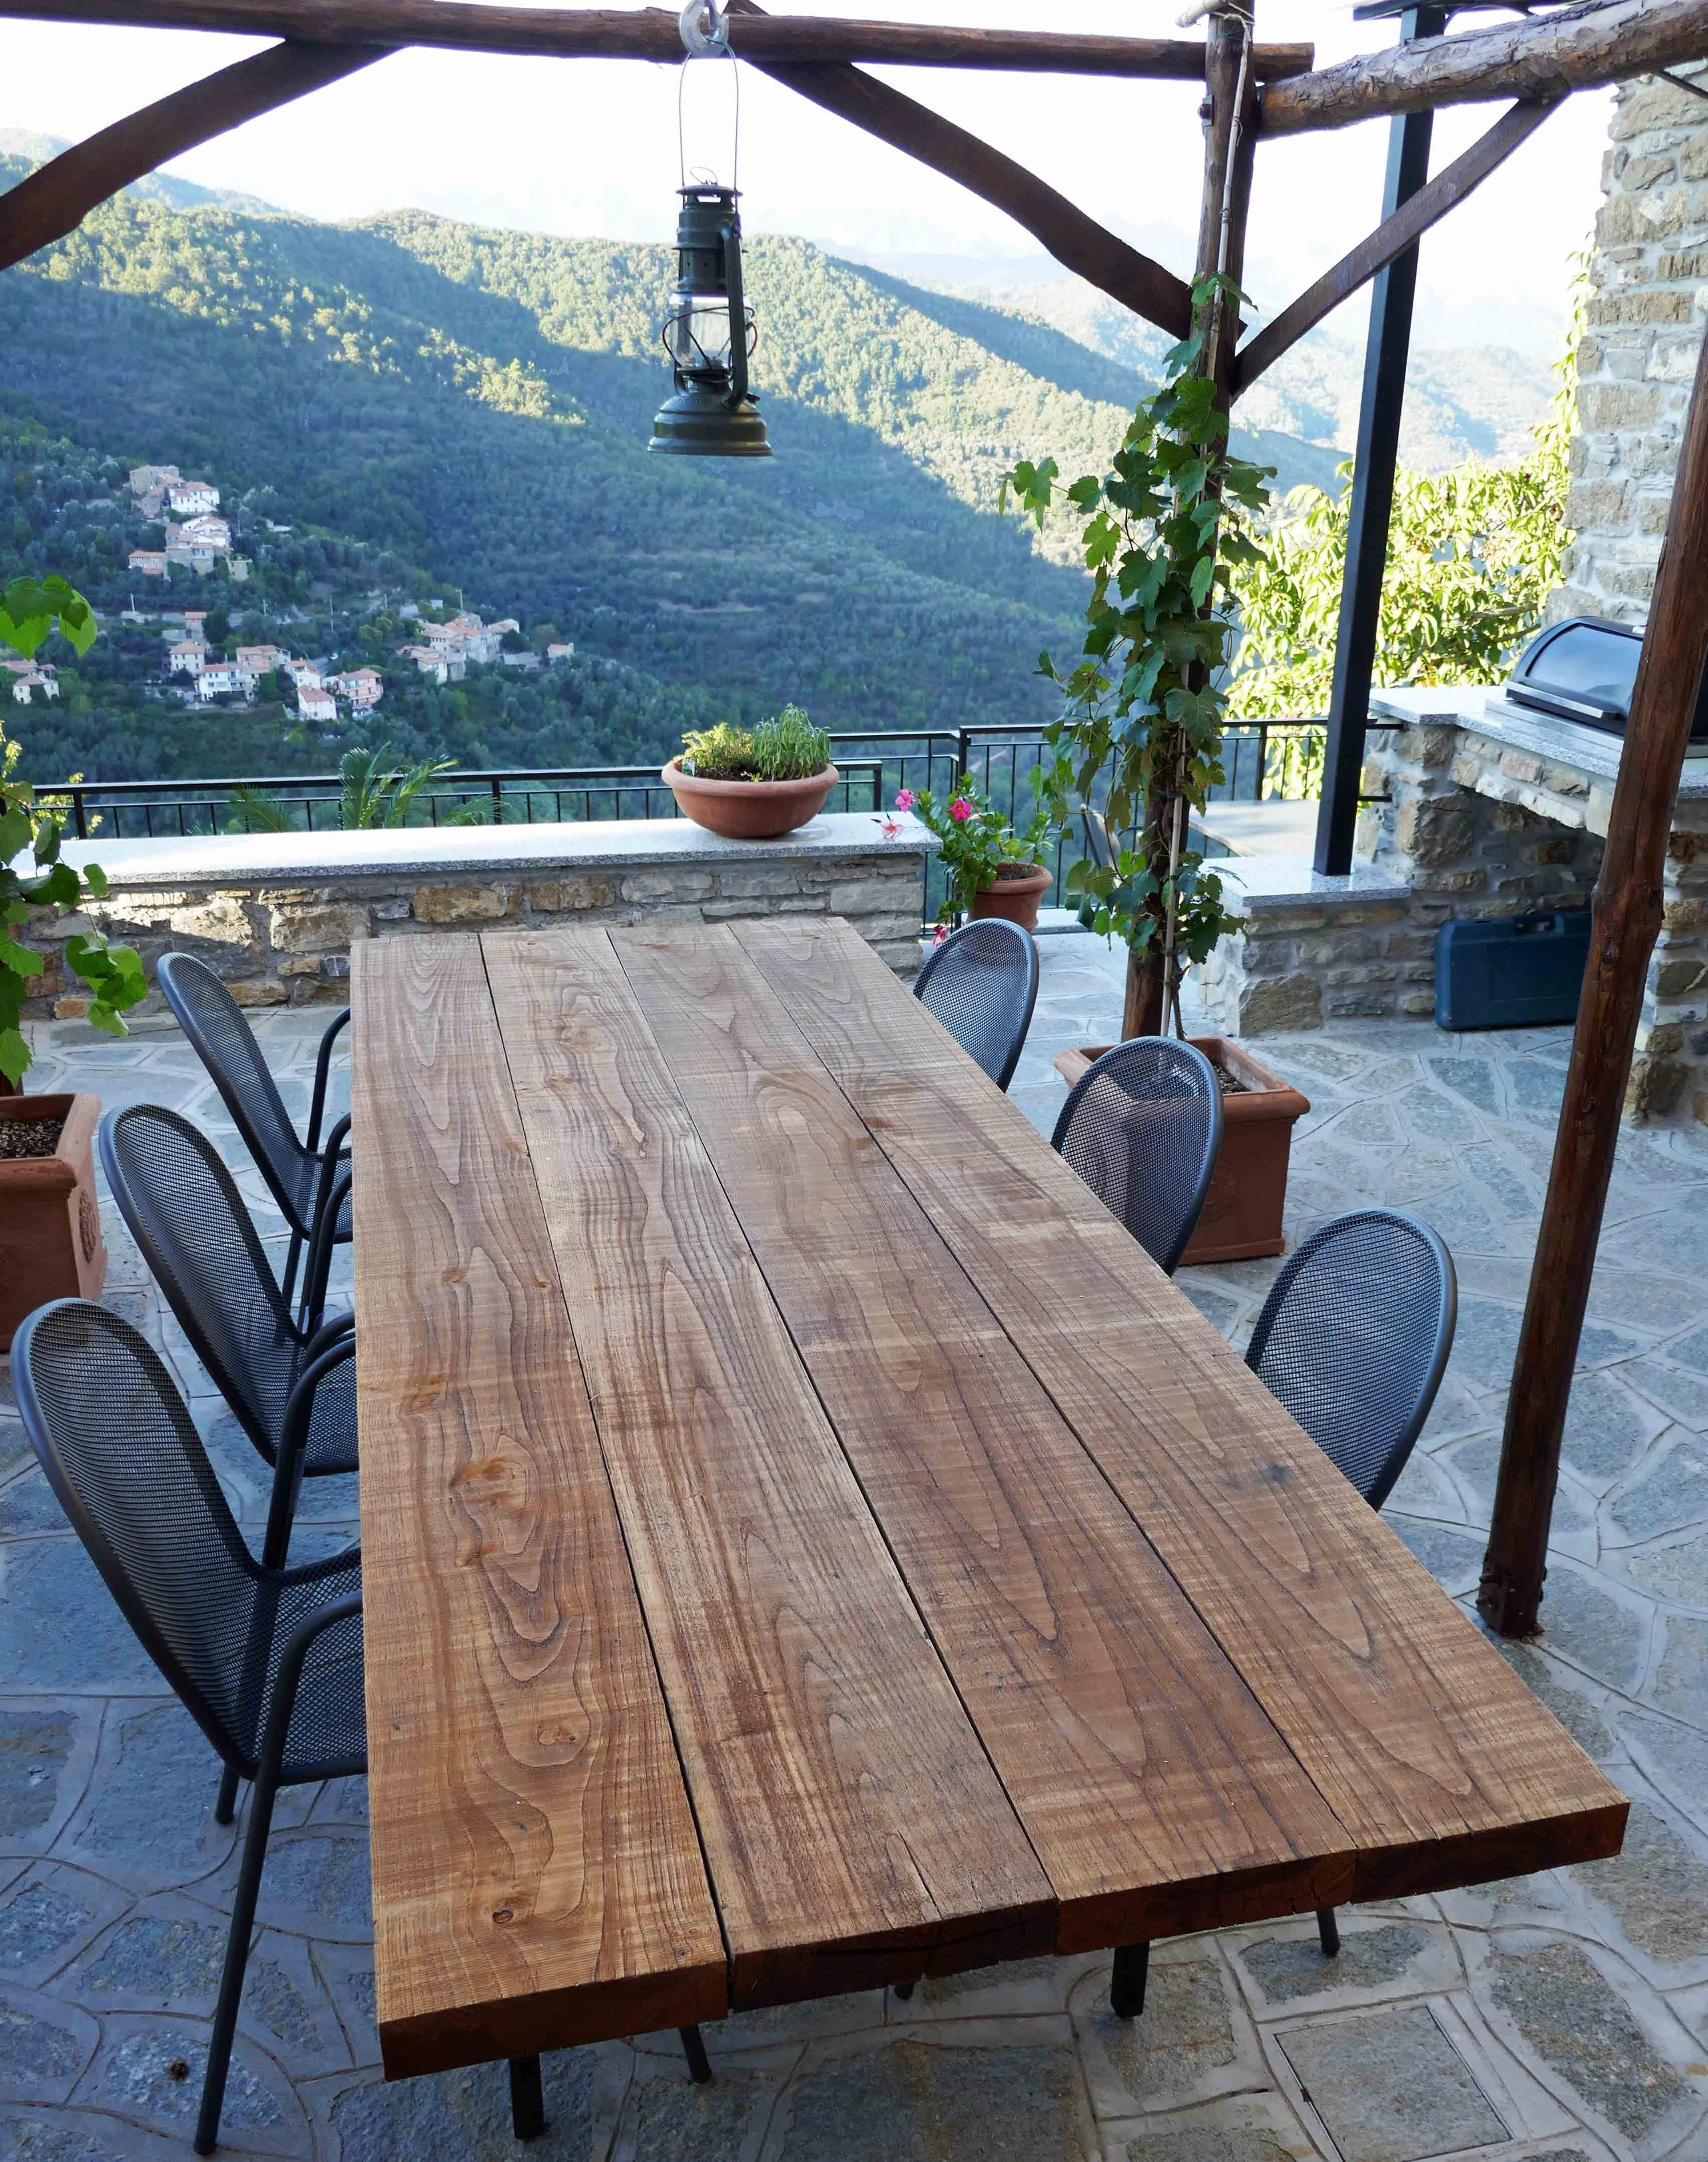 bygga ett bord